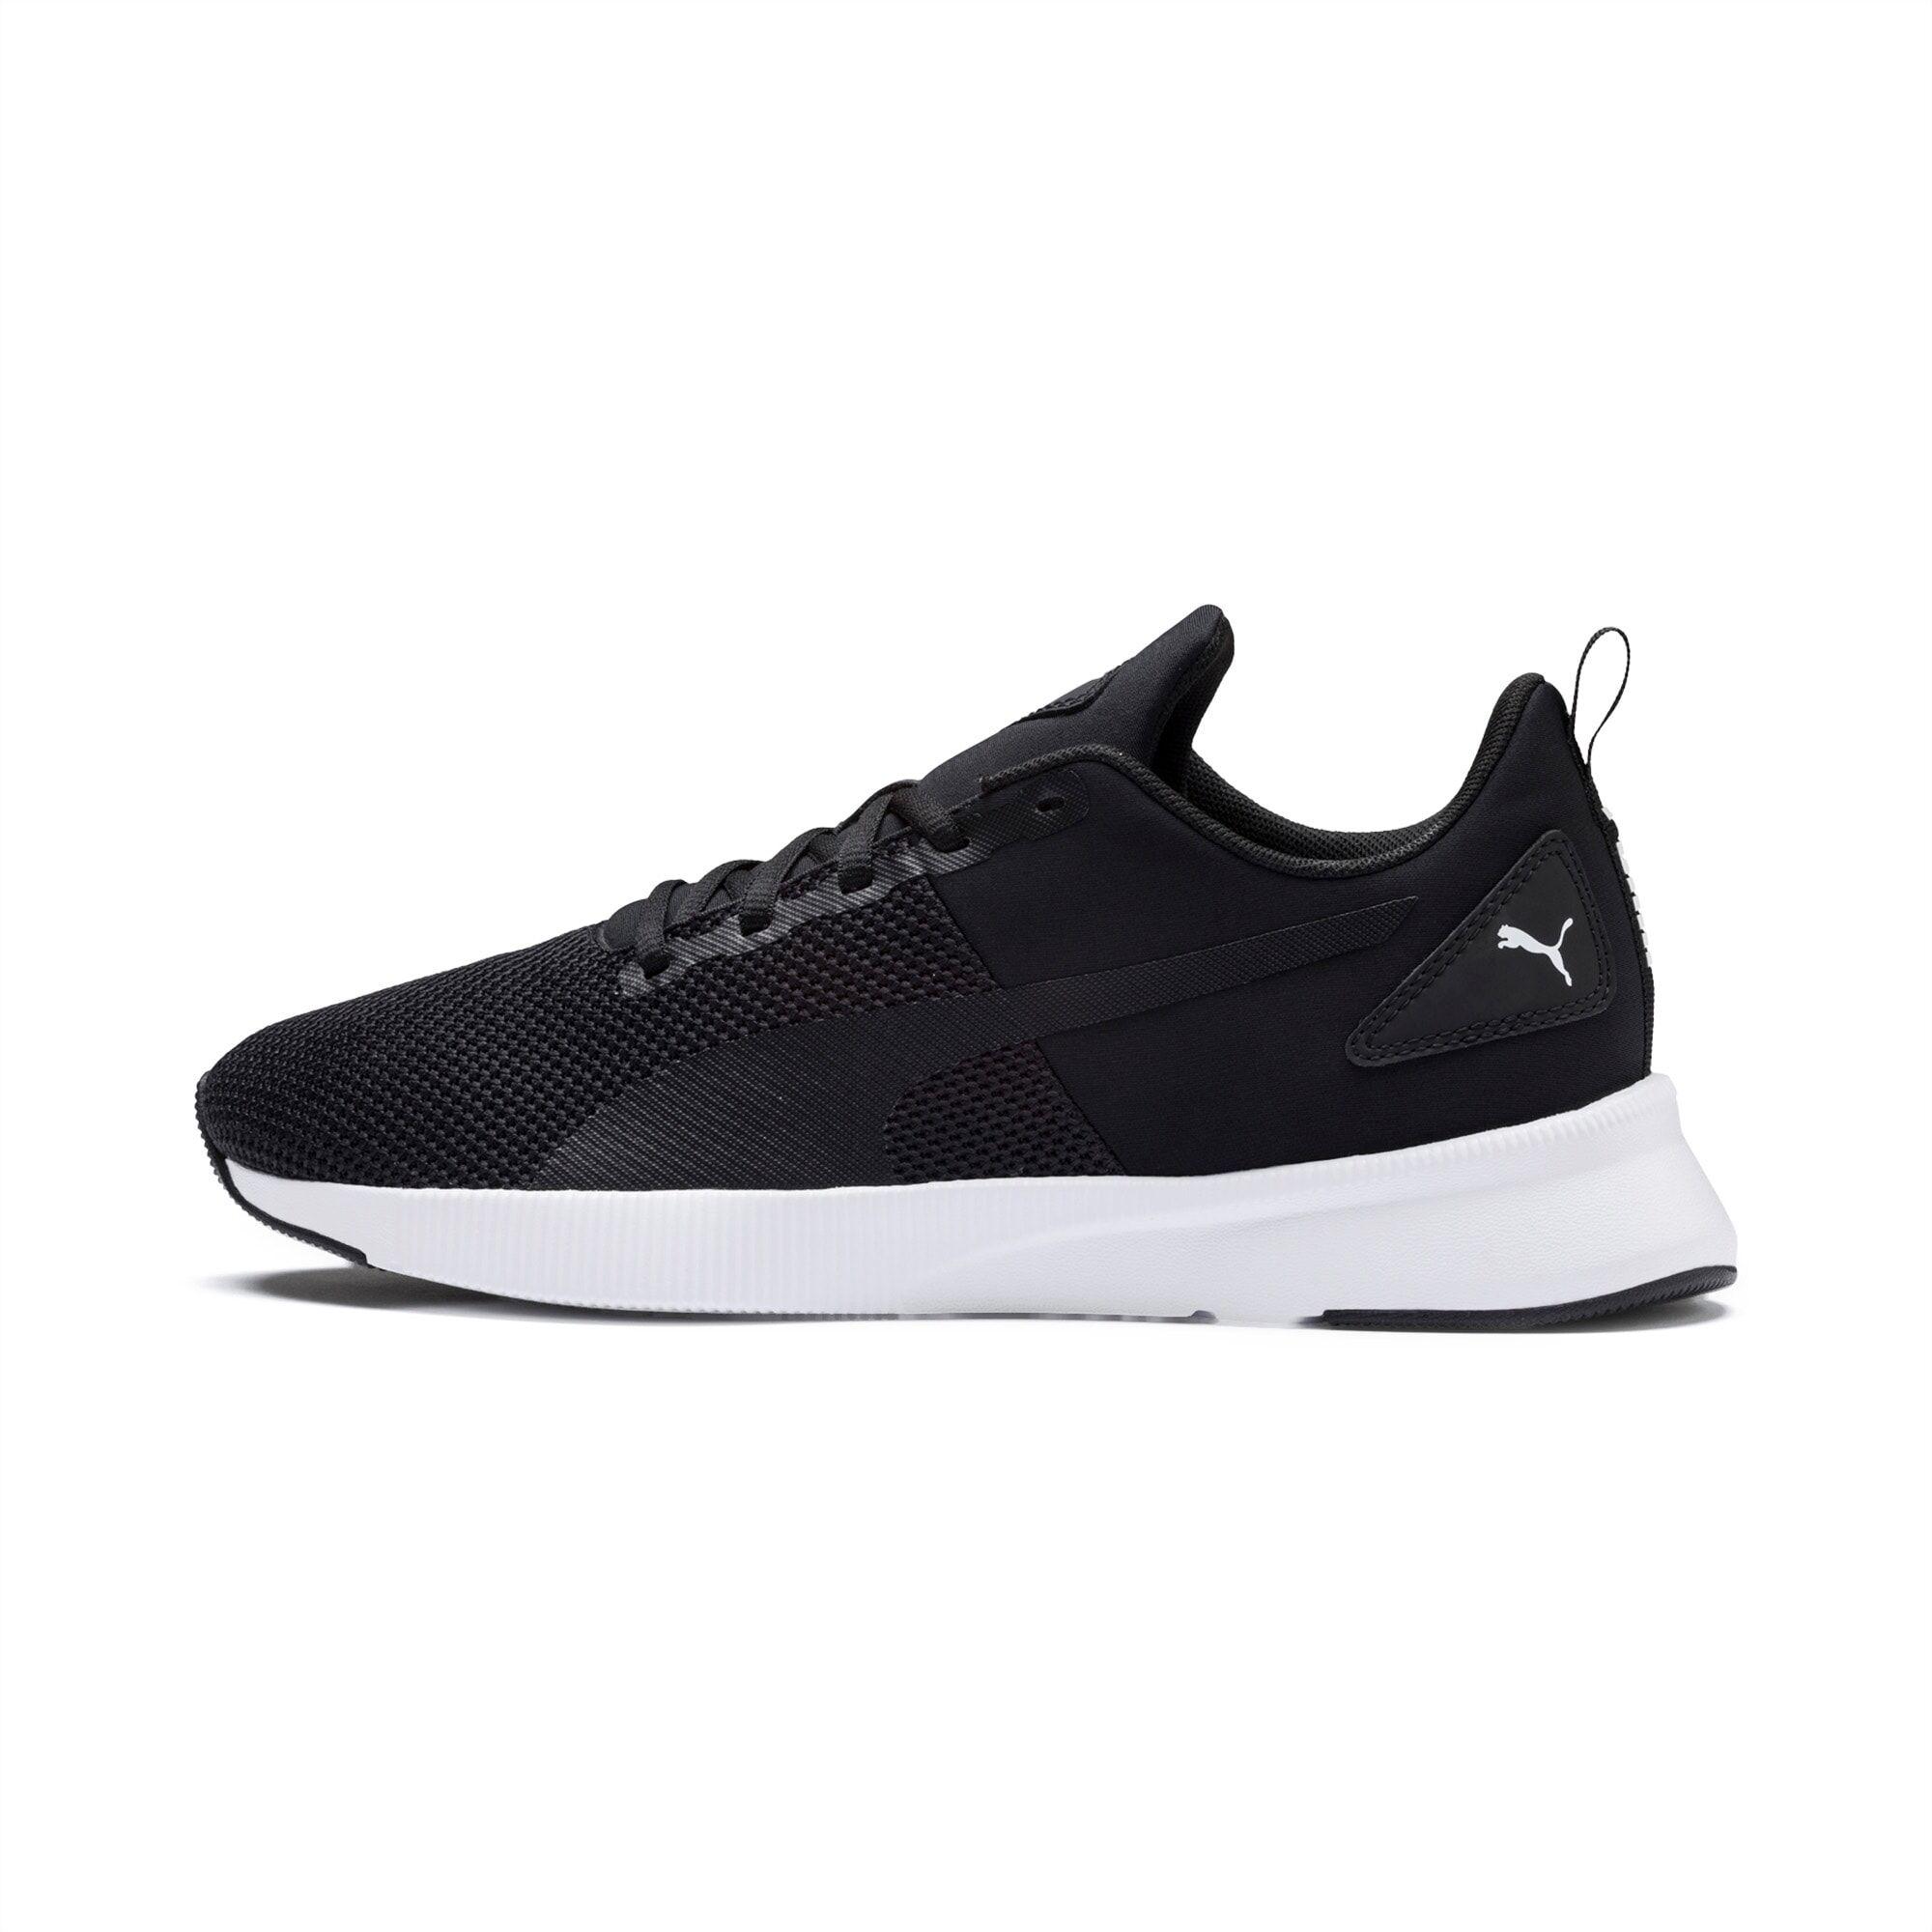 PUMA Chaussure de course Flyer Runner, Noir/Blanc, Taille 37.5, Chaussures